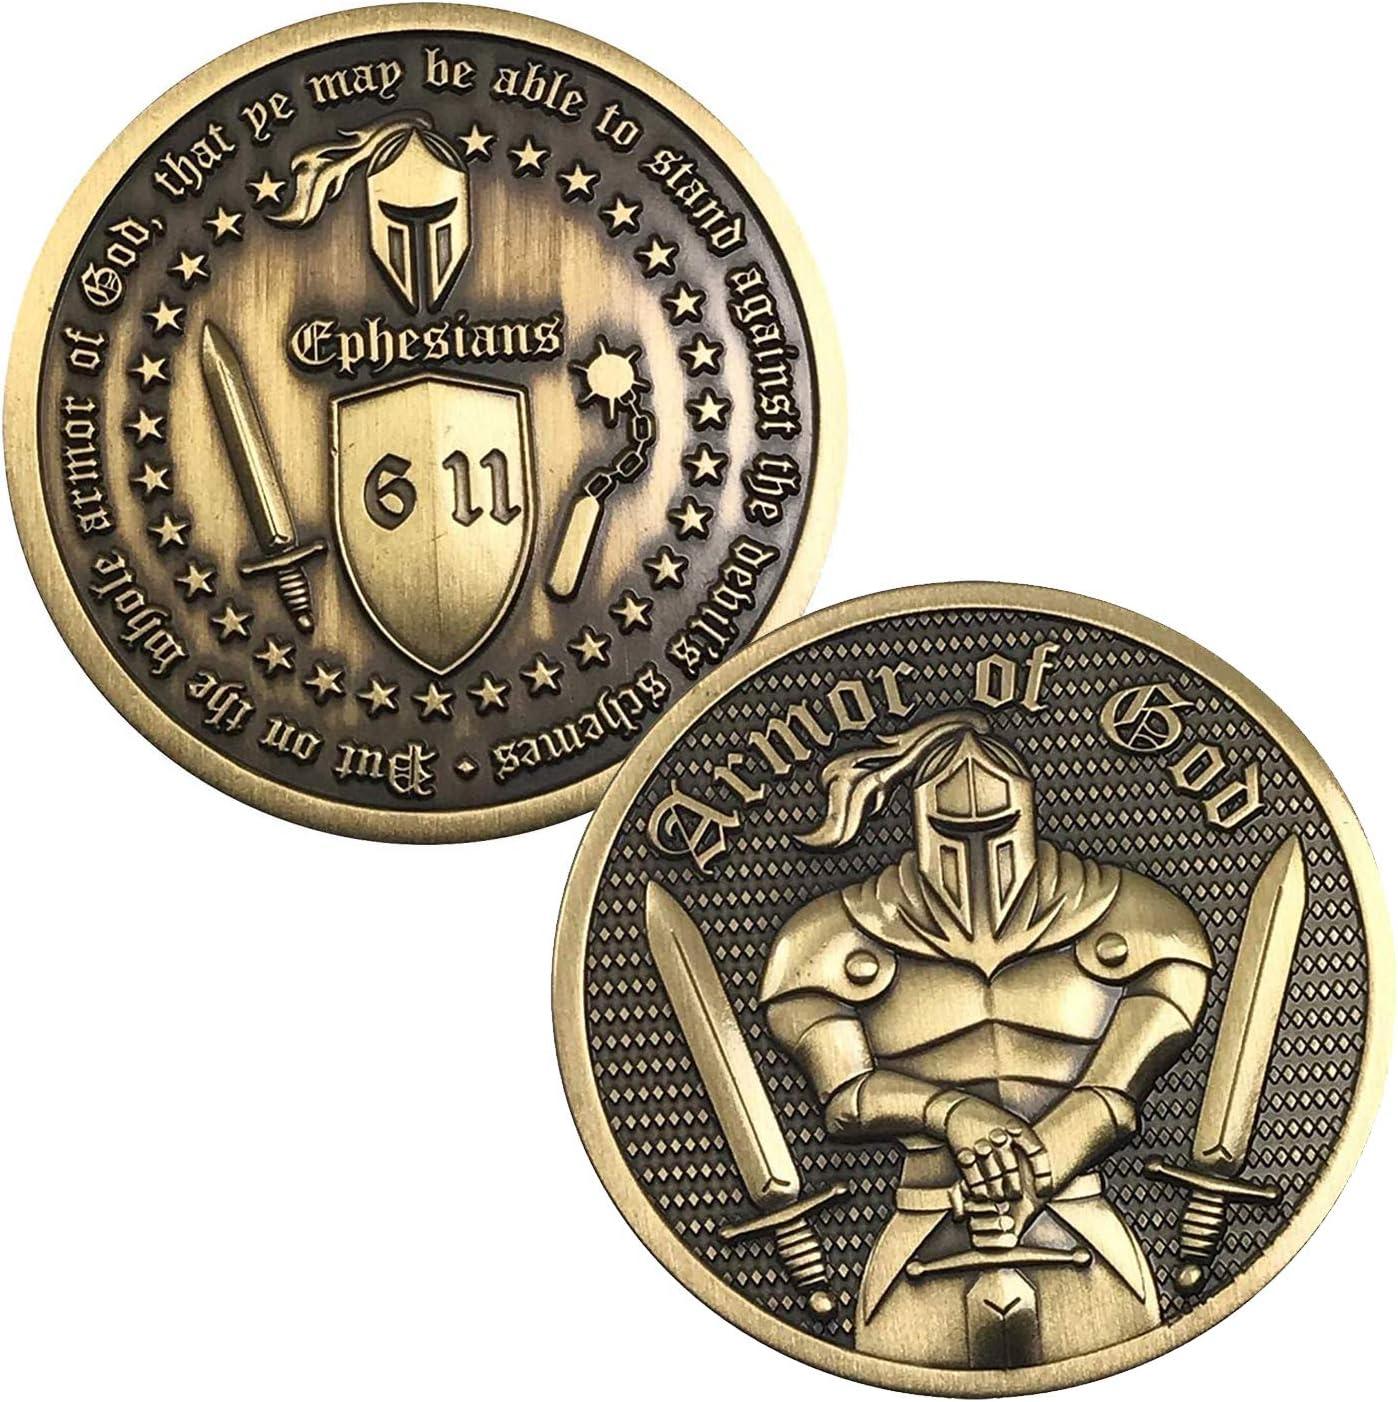 Premium Armor of Max 65% OFF Atlanta Mall God - Commemorative 6:11-3D Ephesians Challenge